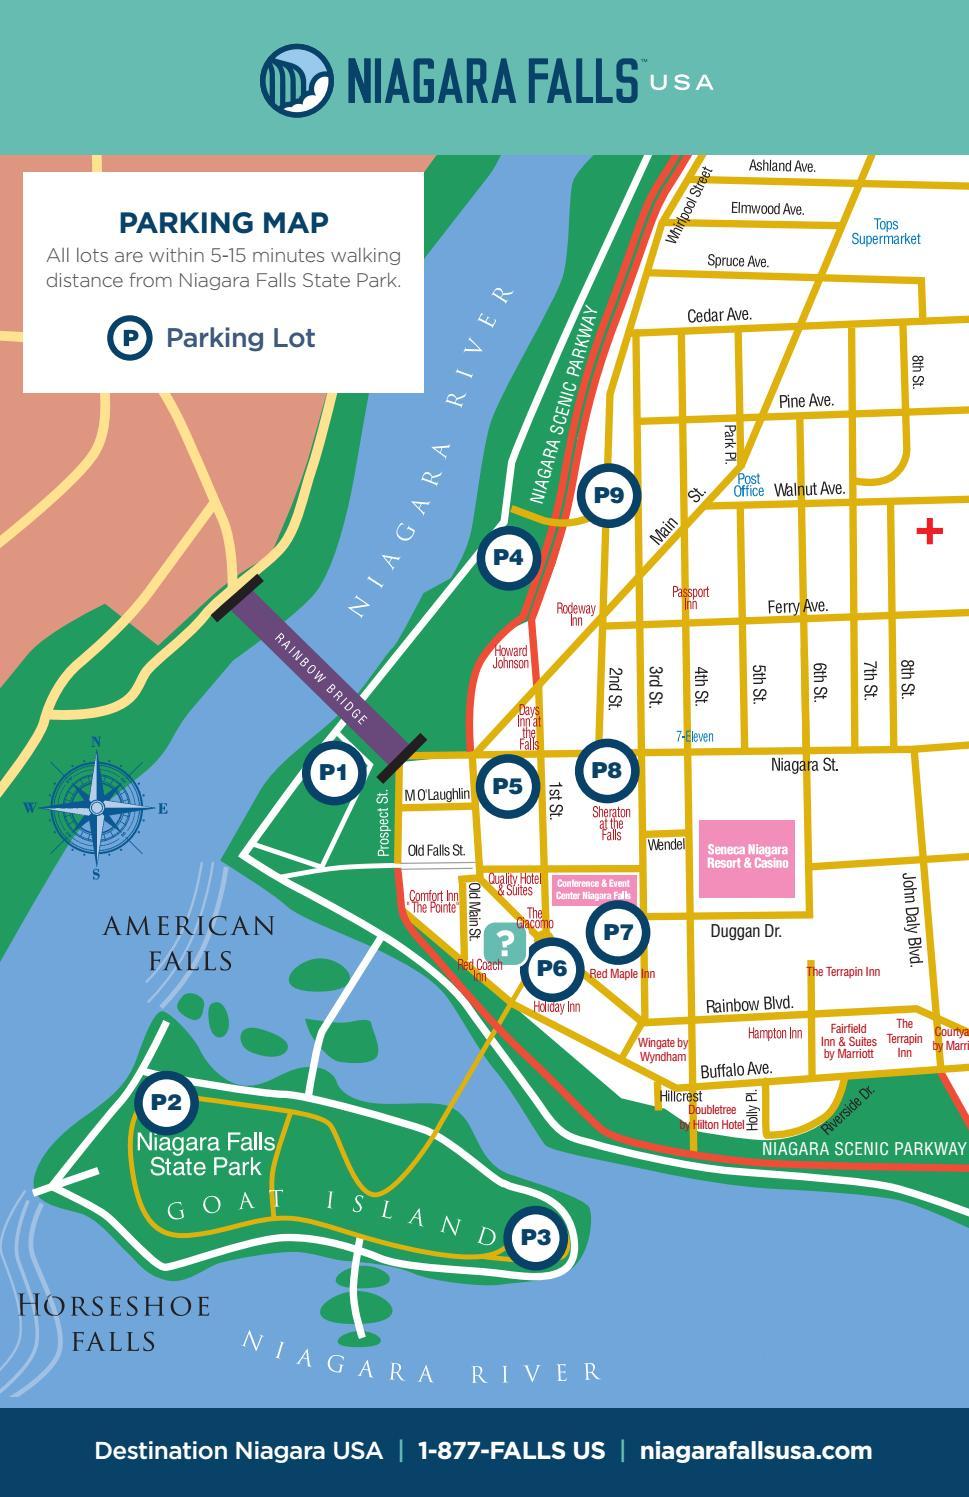 Downtown Niagara Falls USA Parking Map by Destination Niagara USA